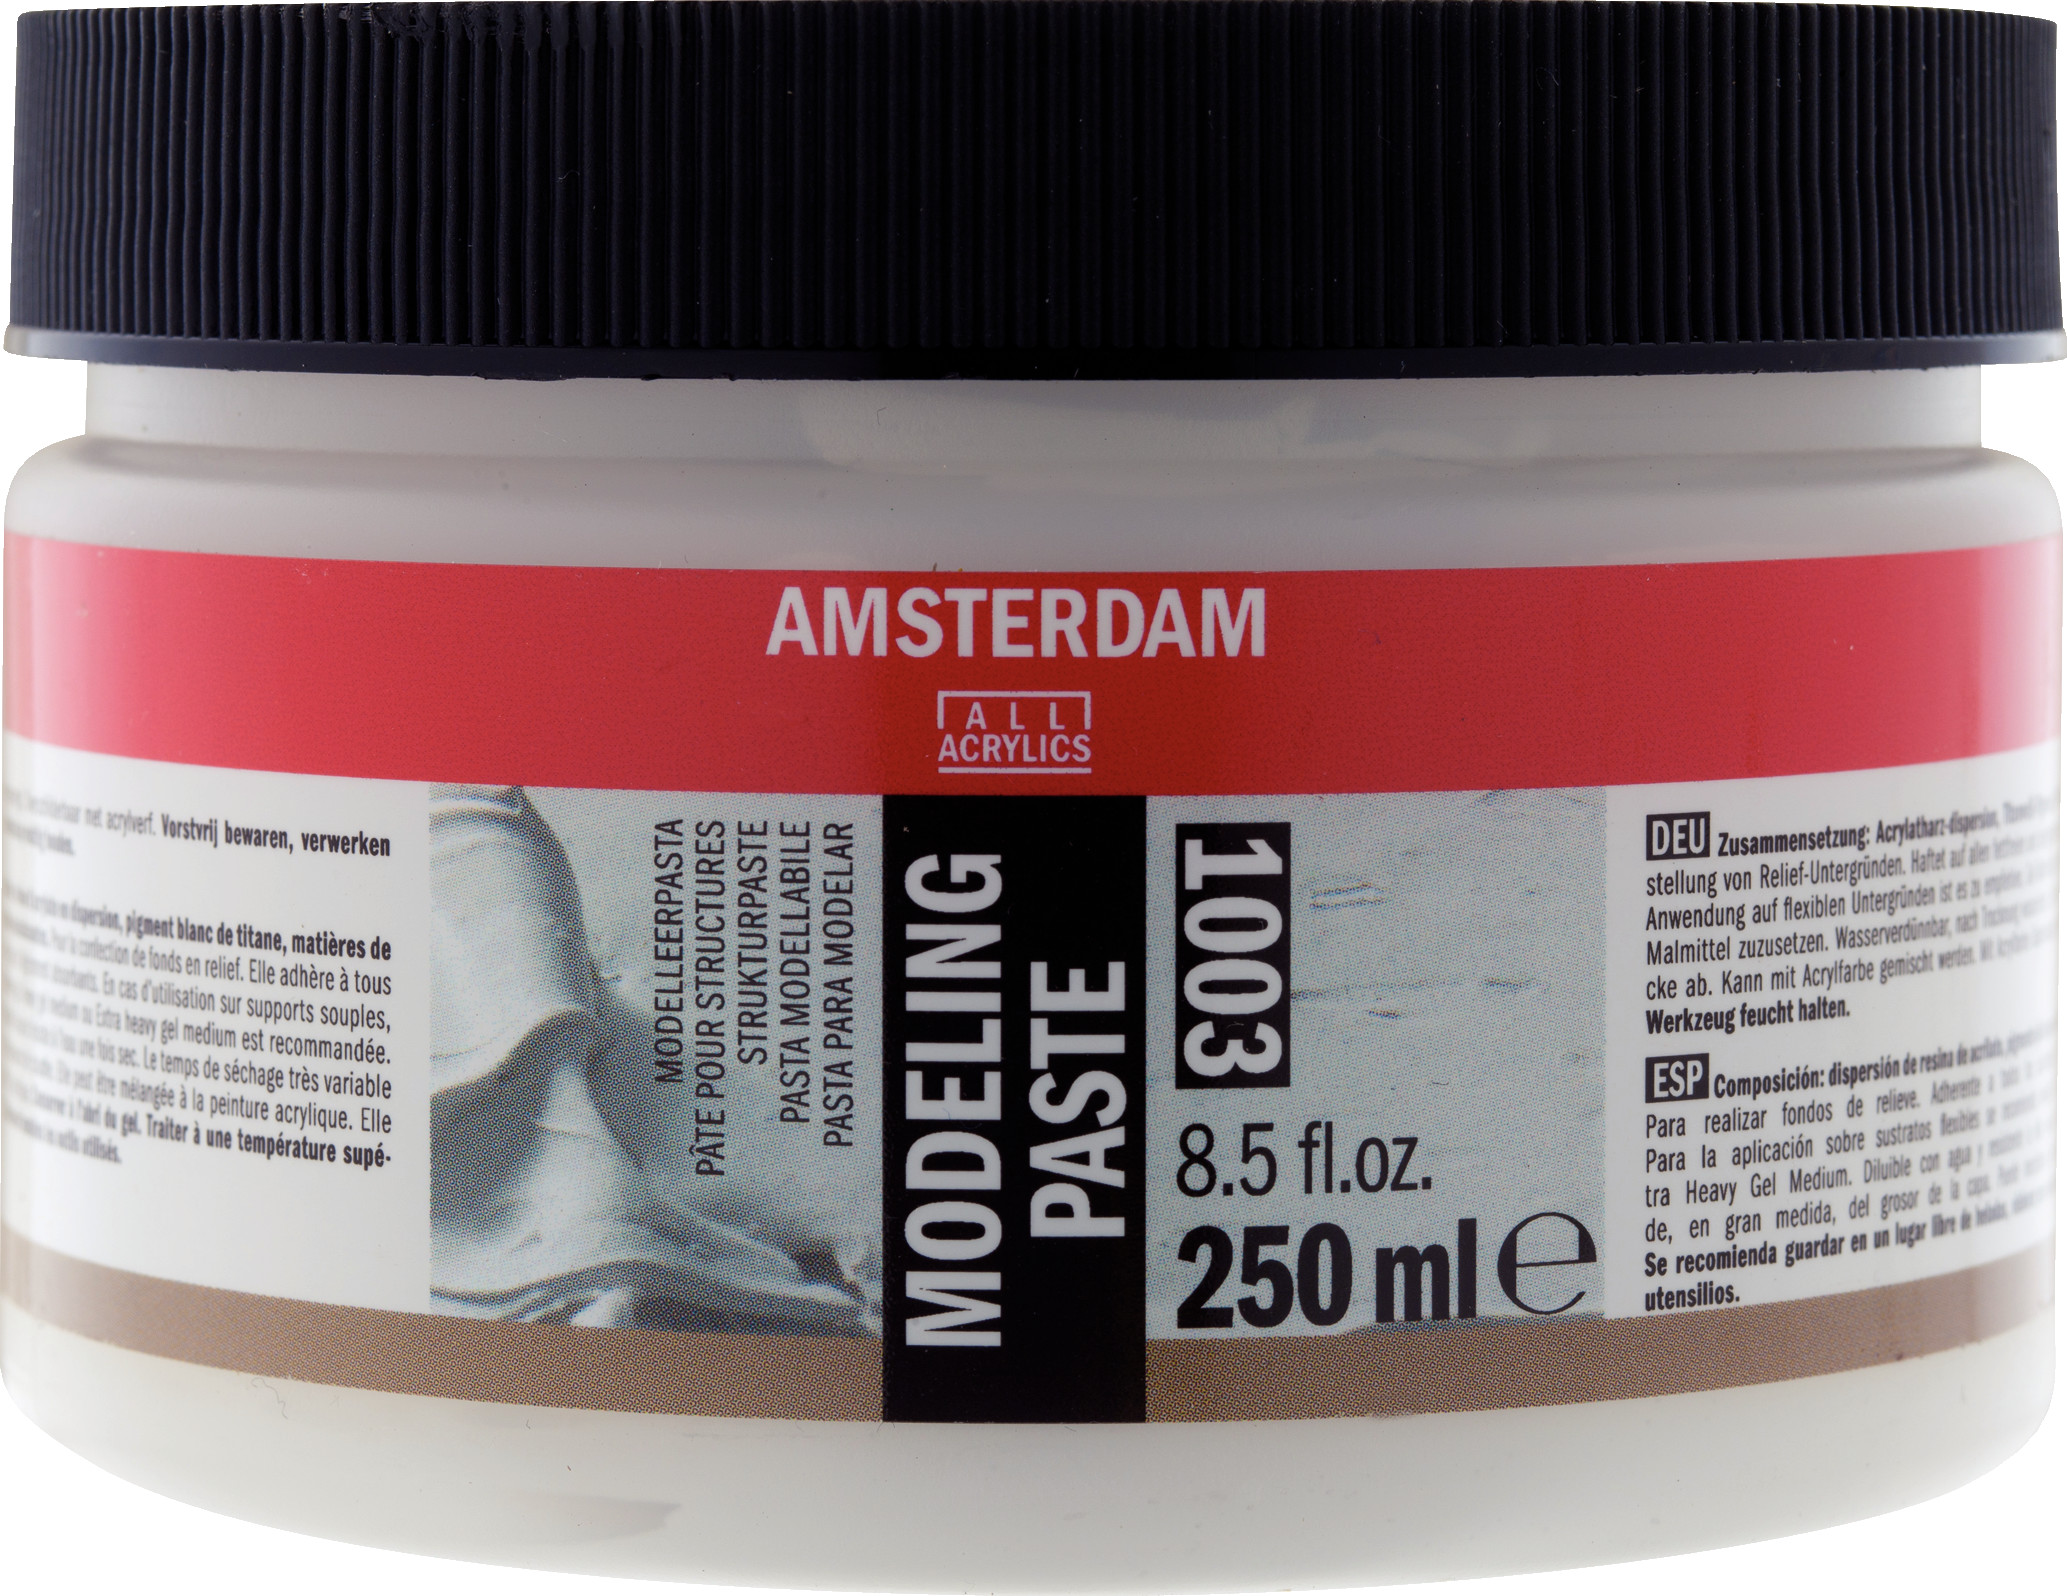 Amsterdam Modeling Paste Jar 250 ml